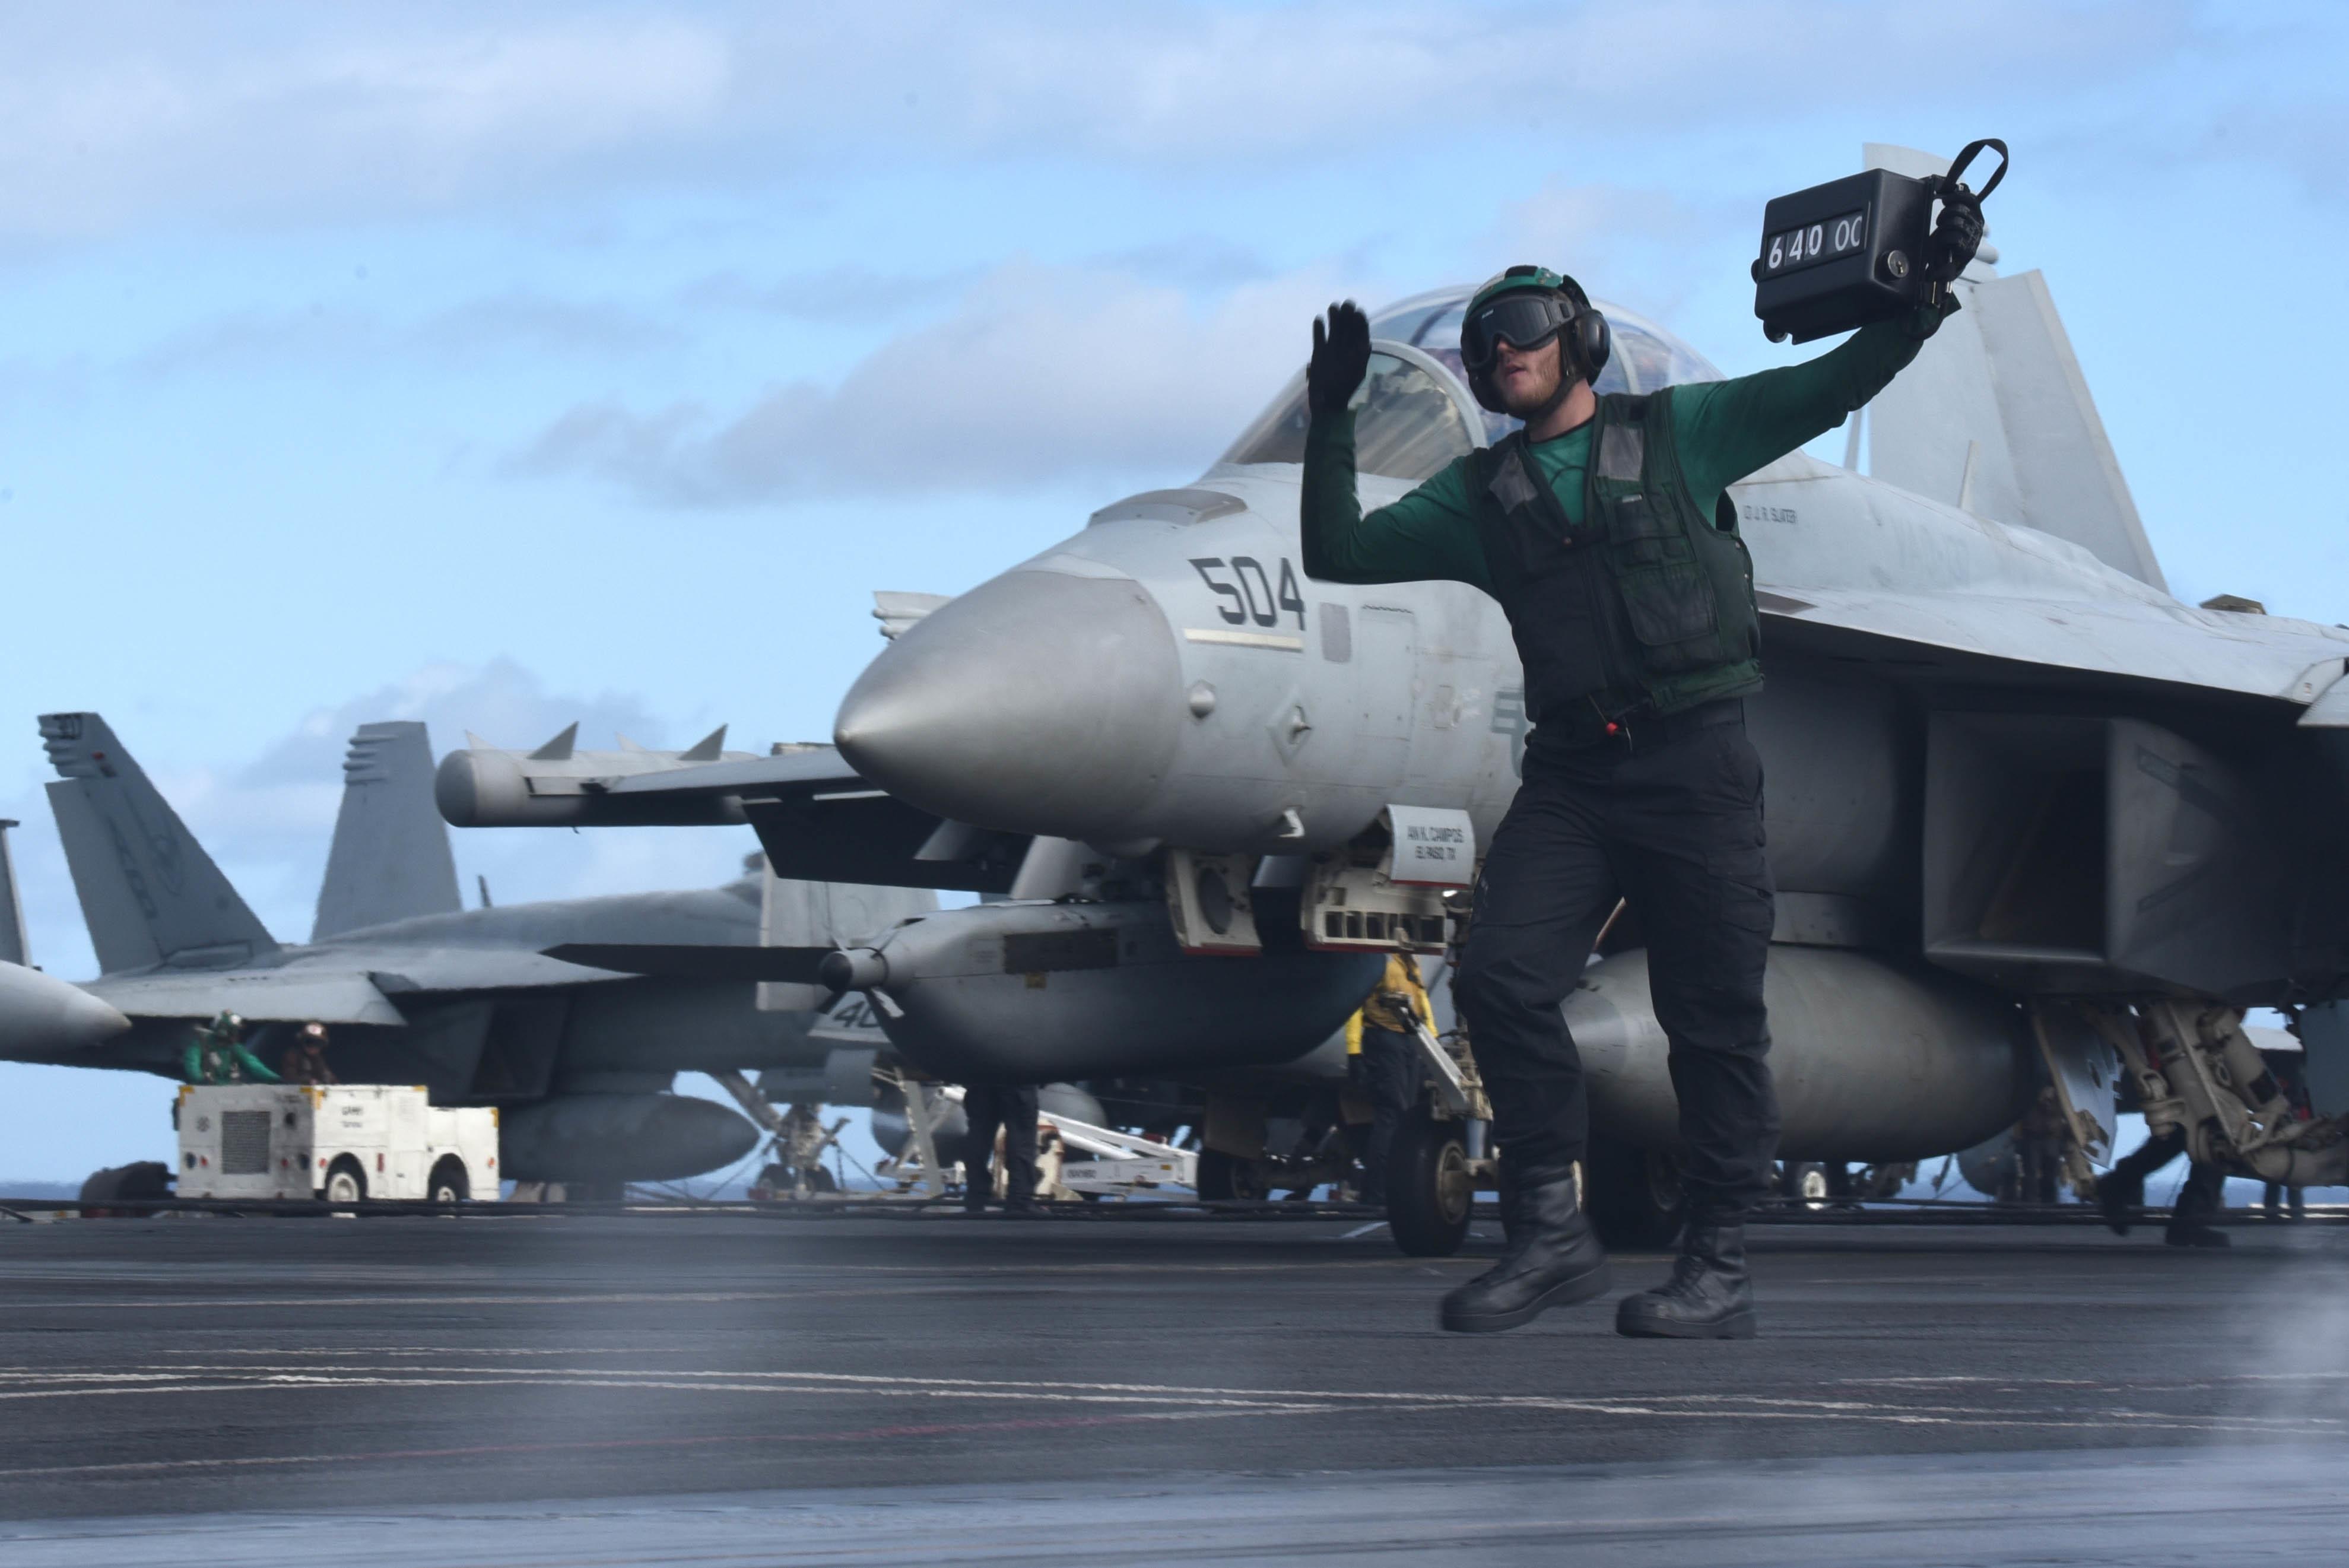 Boeing to Retrofit Existing EA-18G Growler Fleet - USNI News